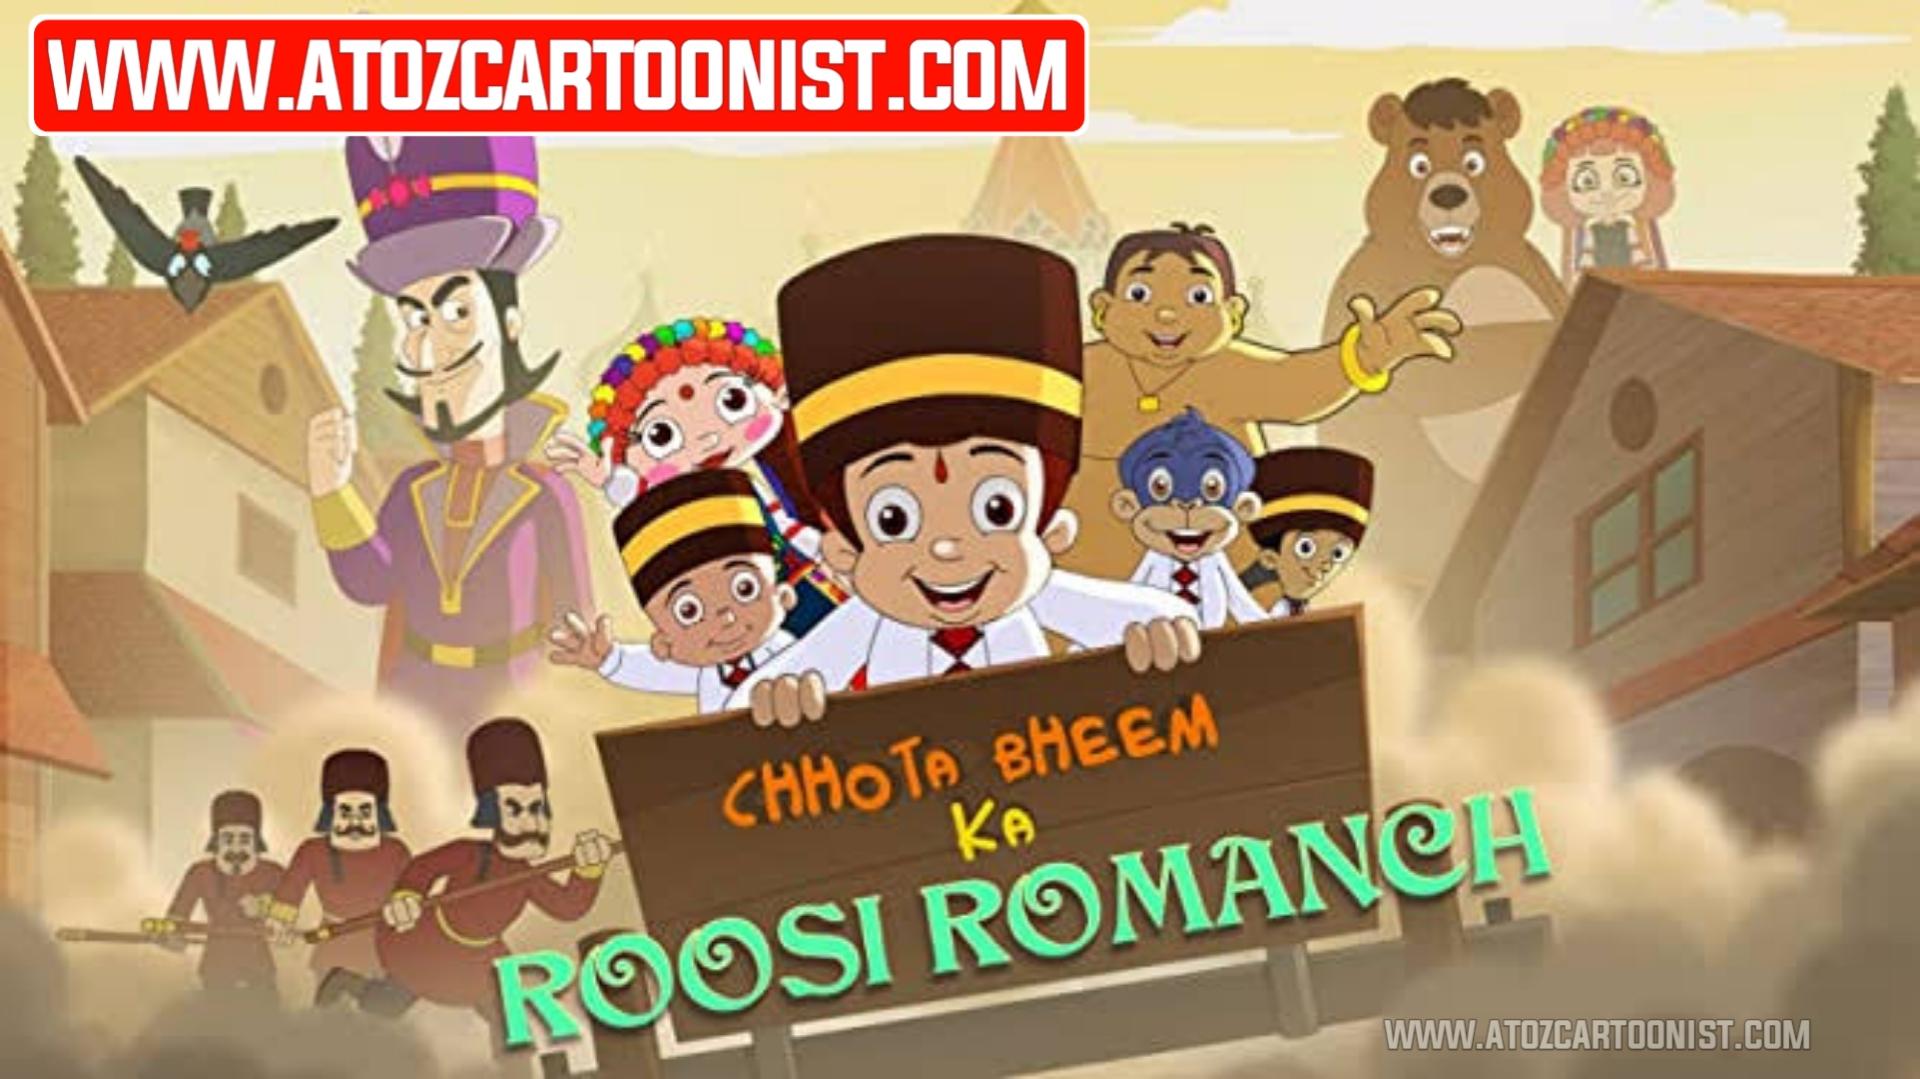 CHHOTA BHEEM KA ROOSI ROMANCH FULL MOVIE IN HINDI & TAMIL DOWNLOAD (480P & 720P)